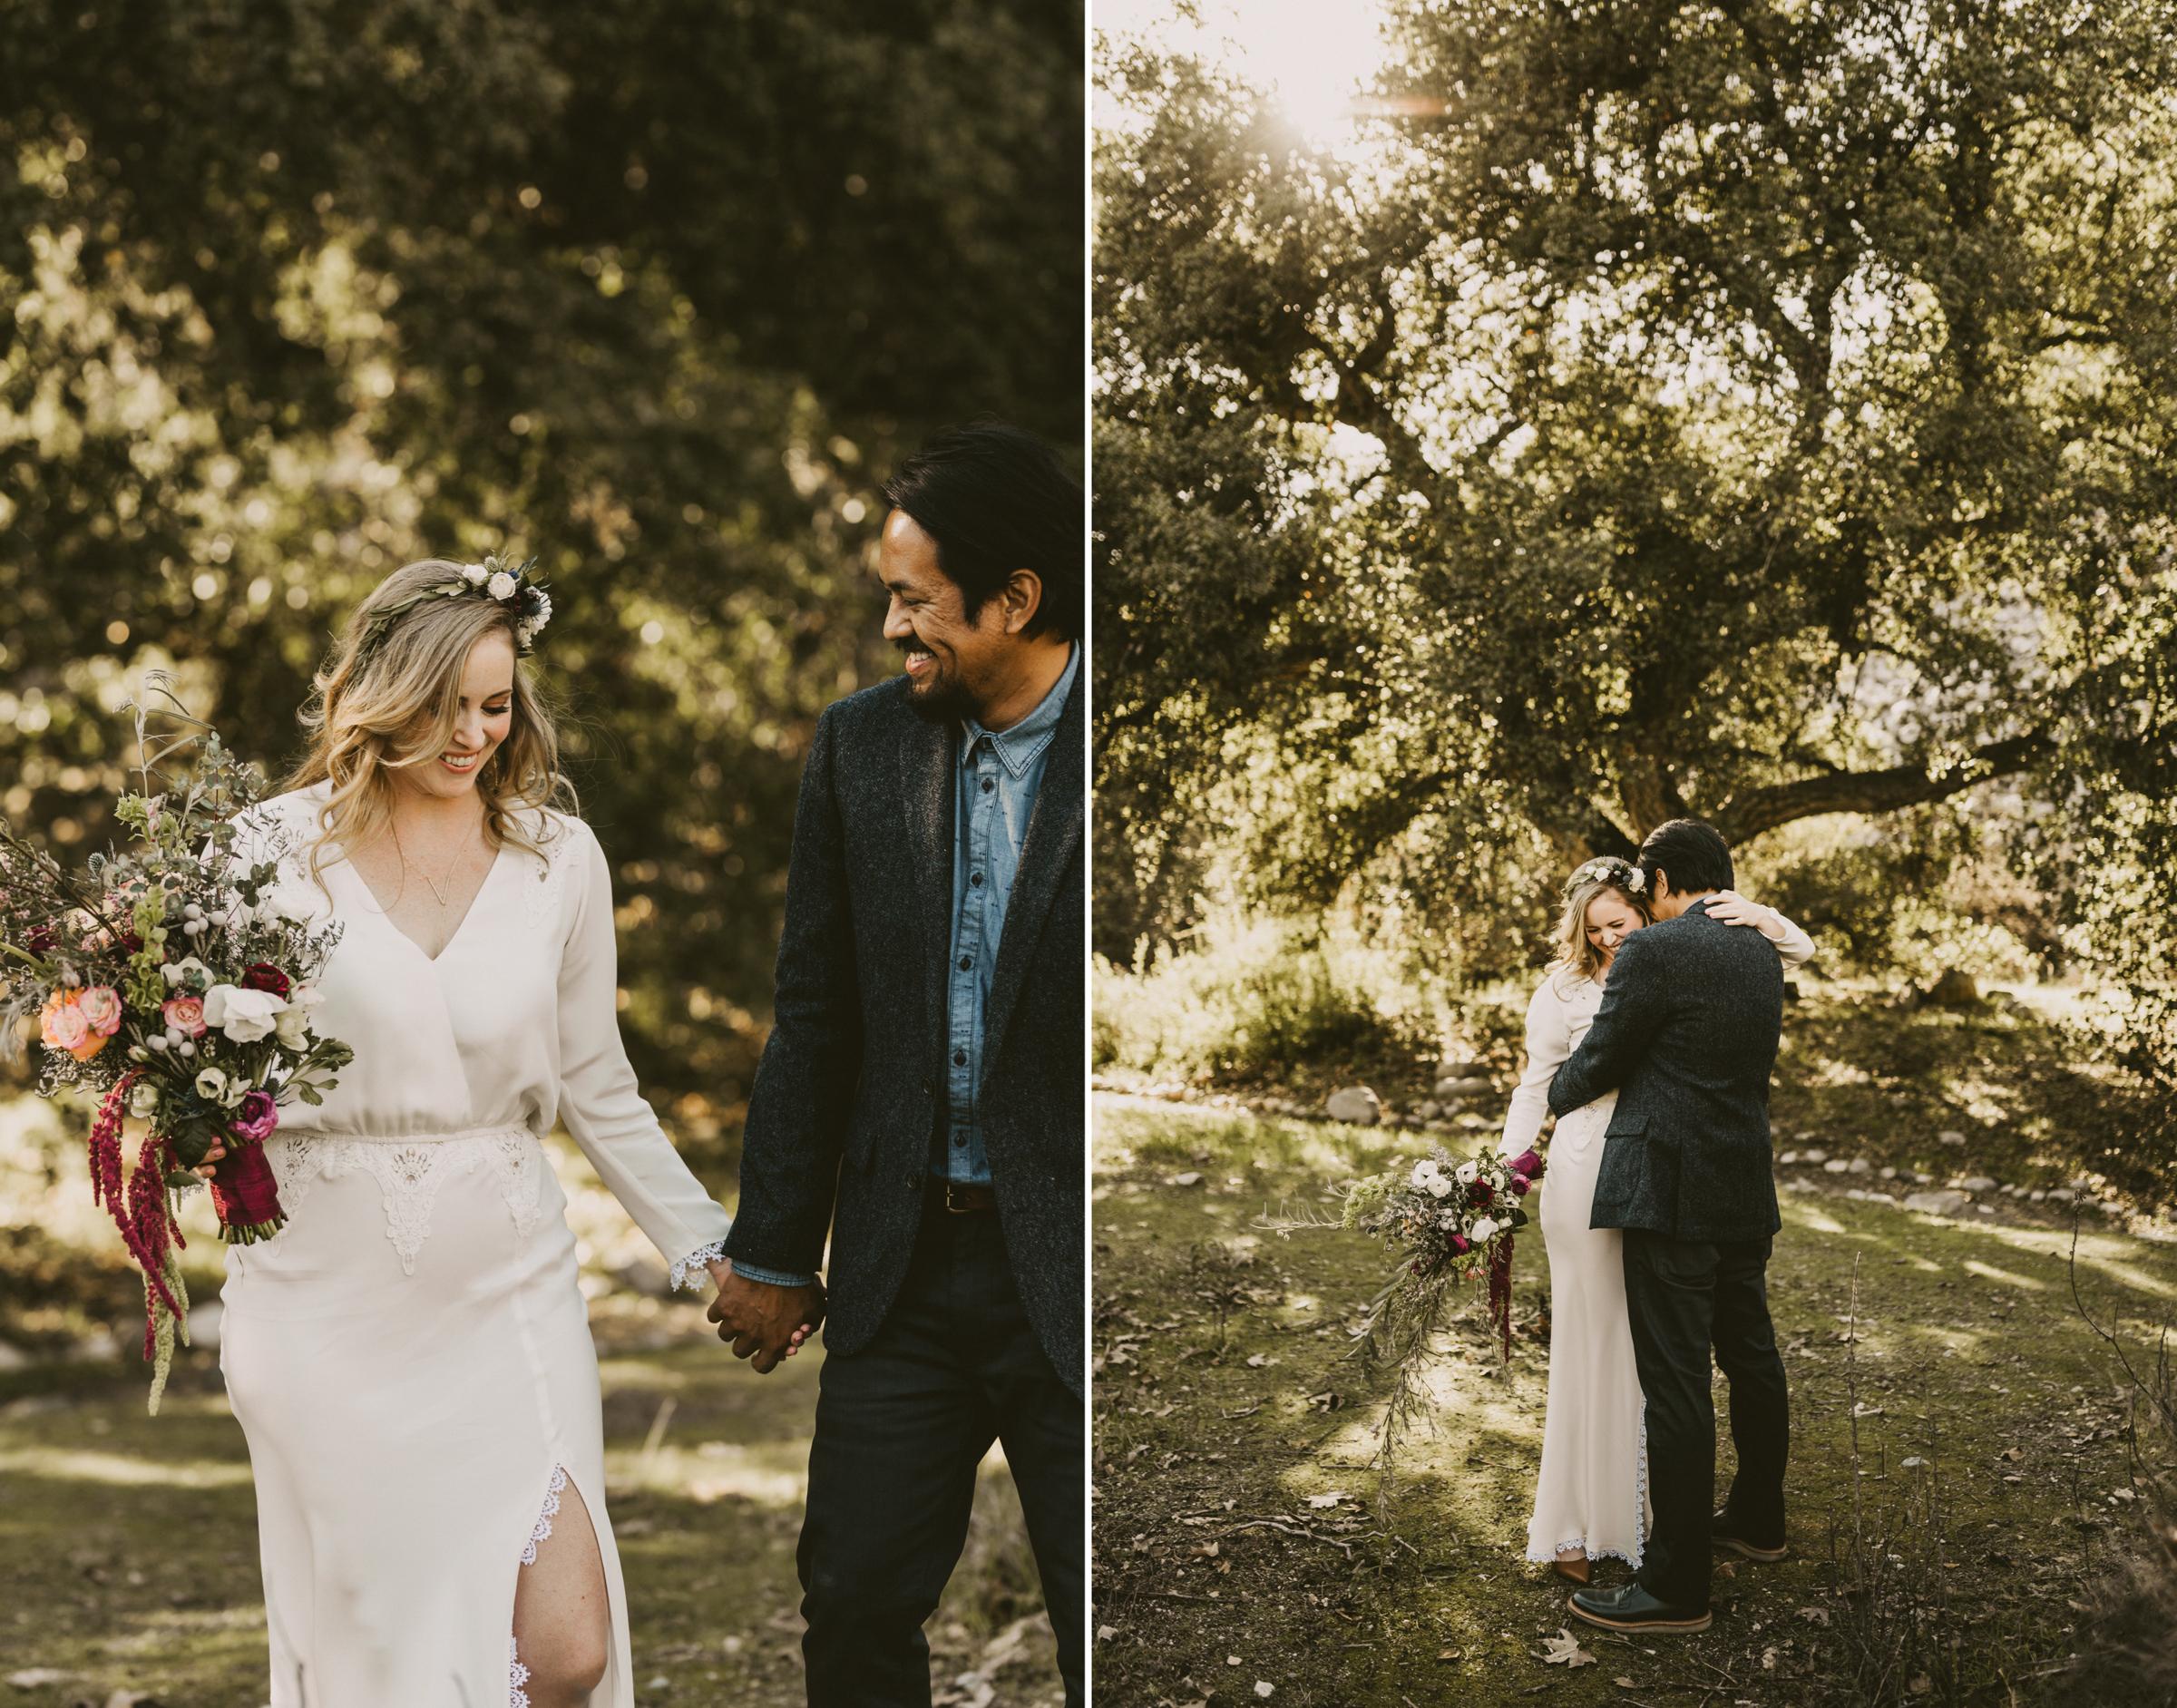 ©Isaiah + Taylor Photography - Intimate Elopement, Eaton Canyon, Los Angeles Wedding Photographer-13.jpg